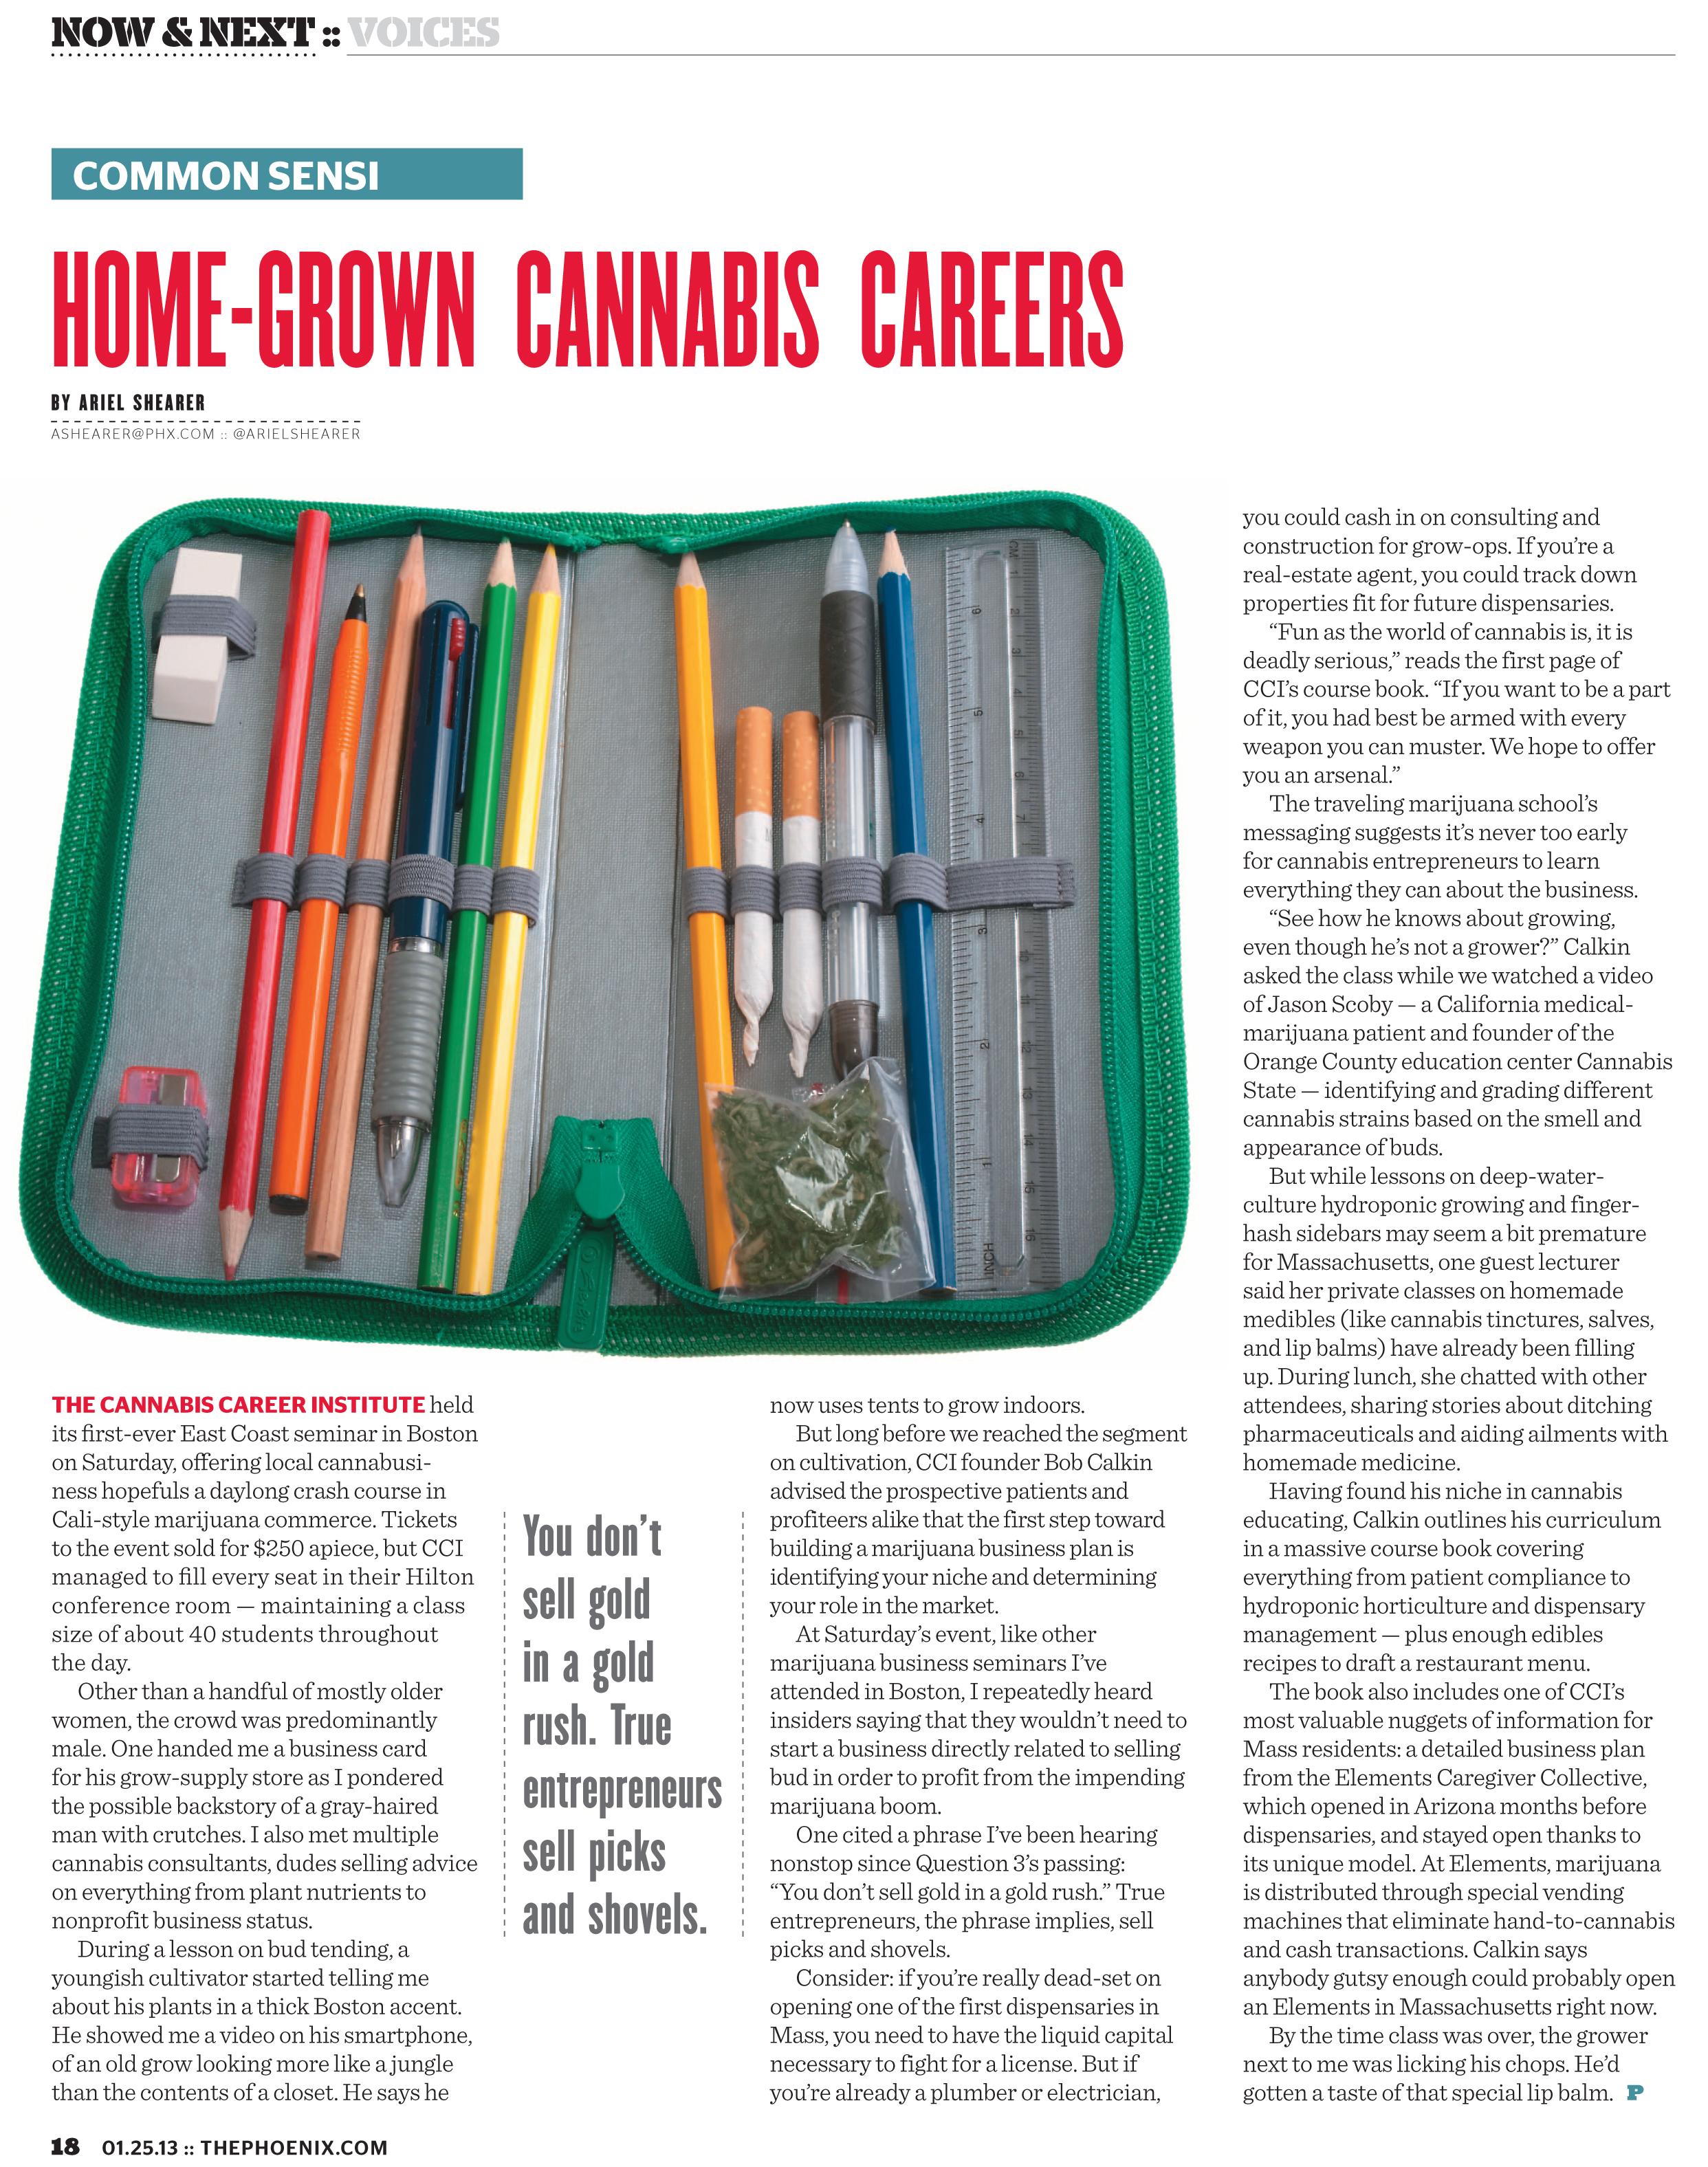 012513_COMMONSENSI - cannabis careers.jpg